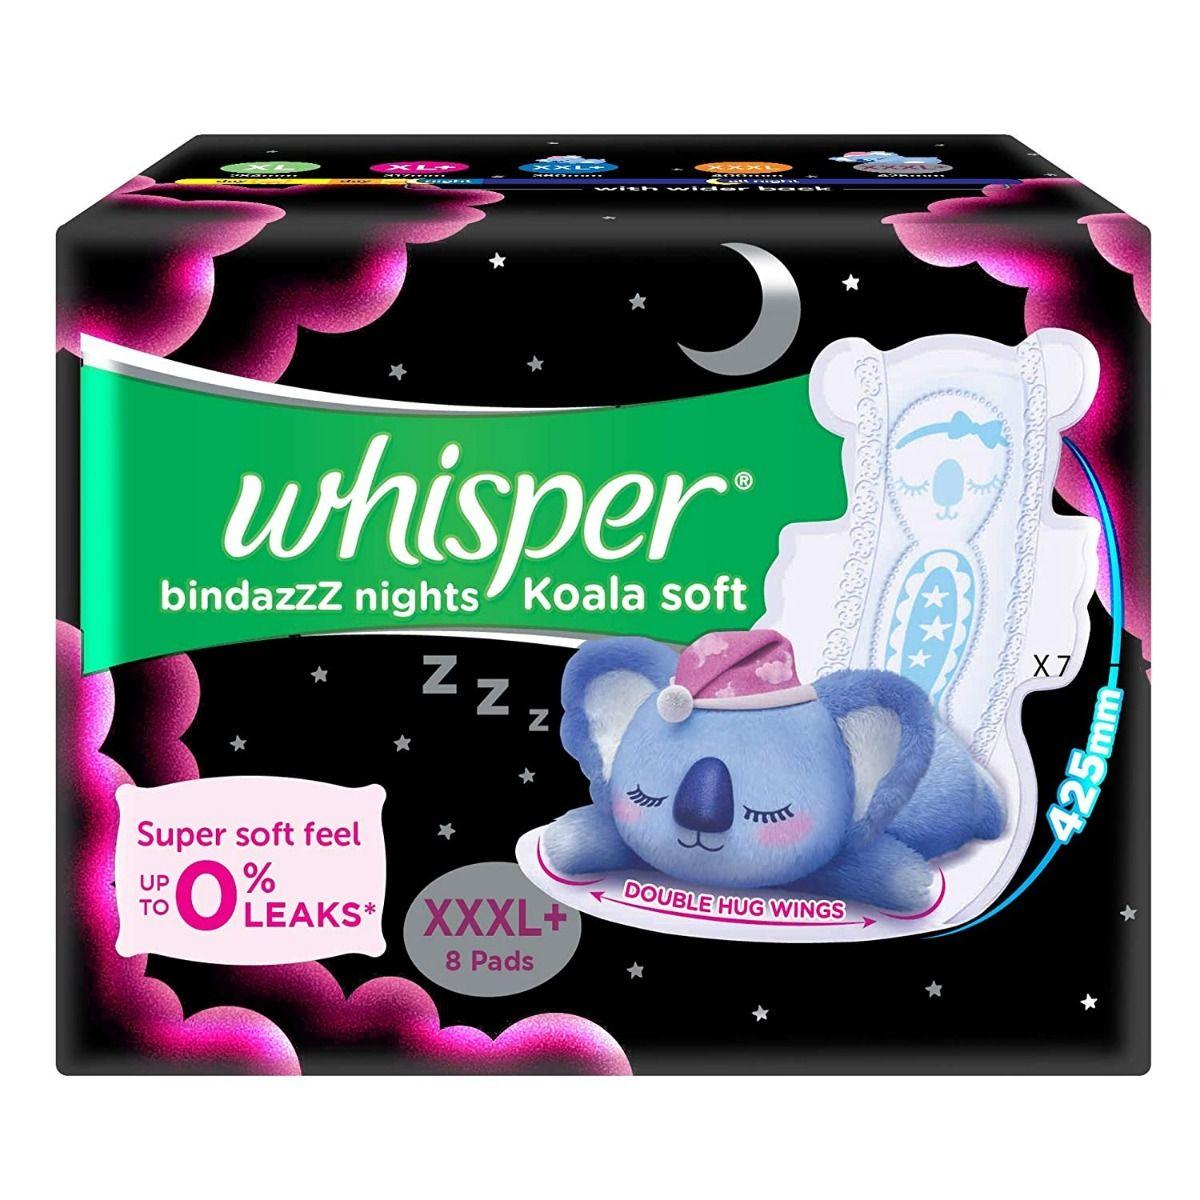 Whisper Bindazz Nights Koala Soft Sanitary Pads XXXL+, 8 Count